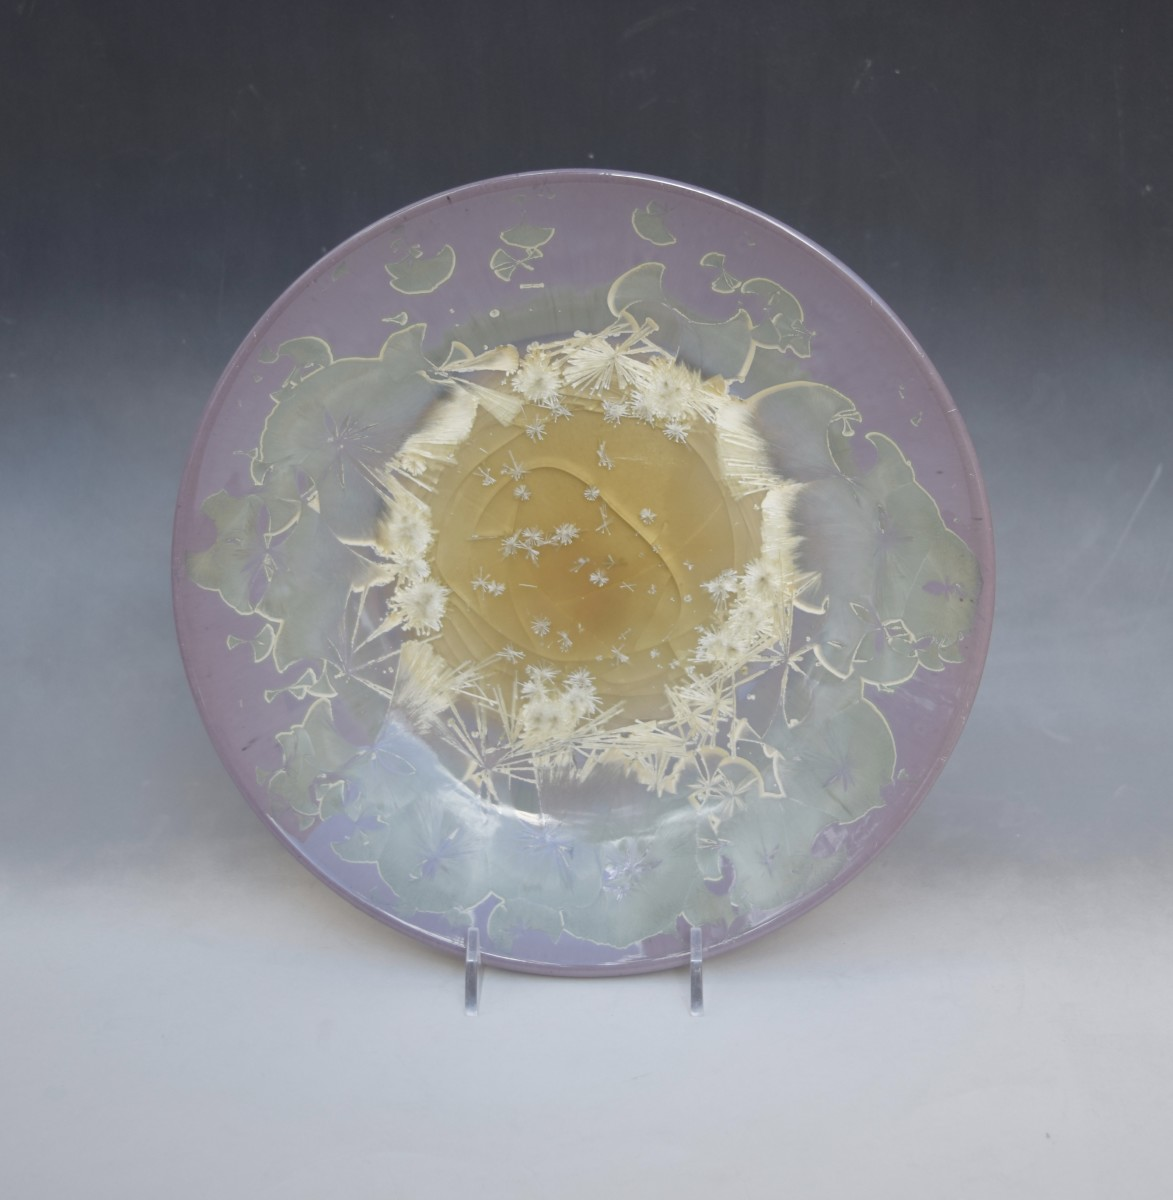 Lavender Bowl by Nichole Vikdal